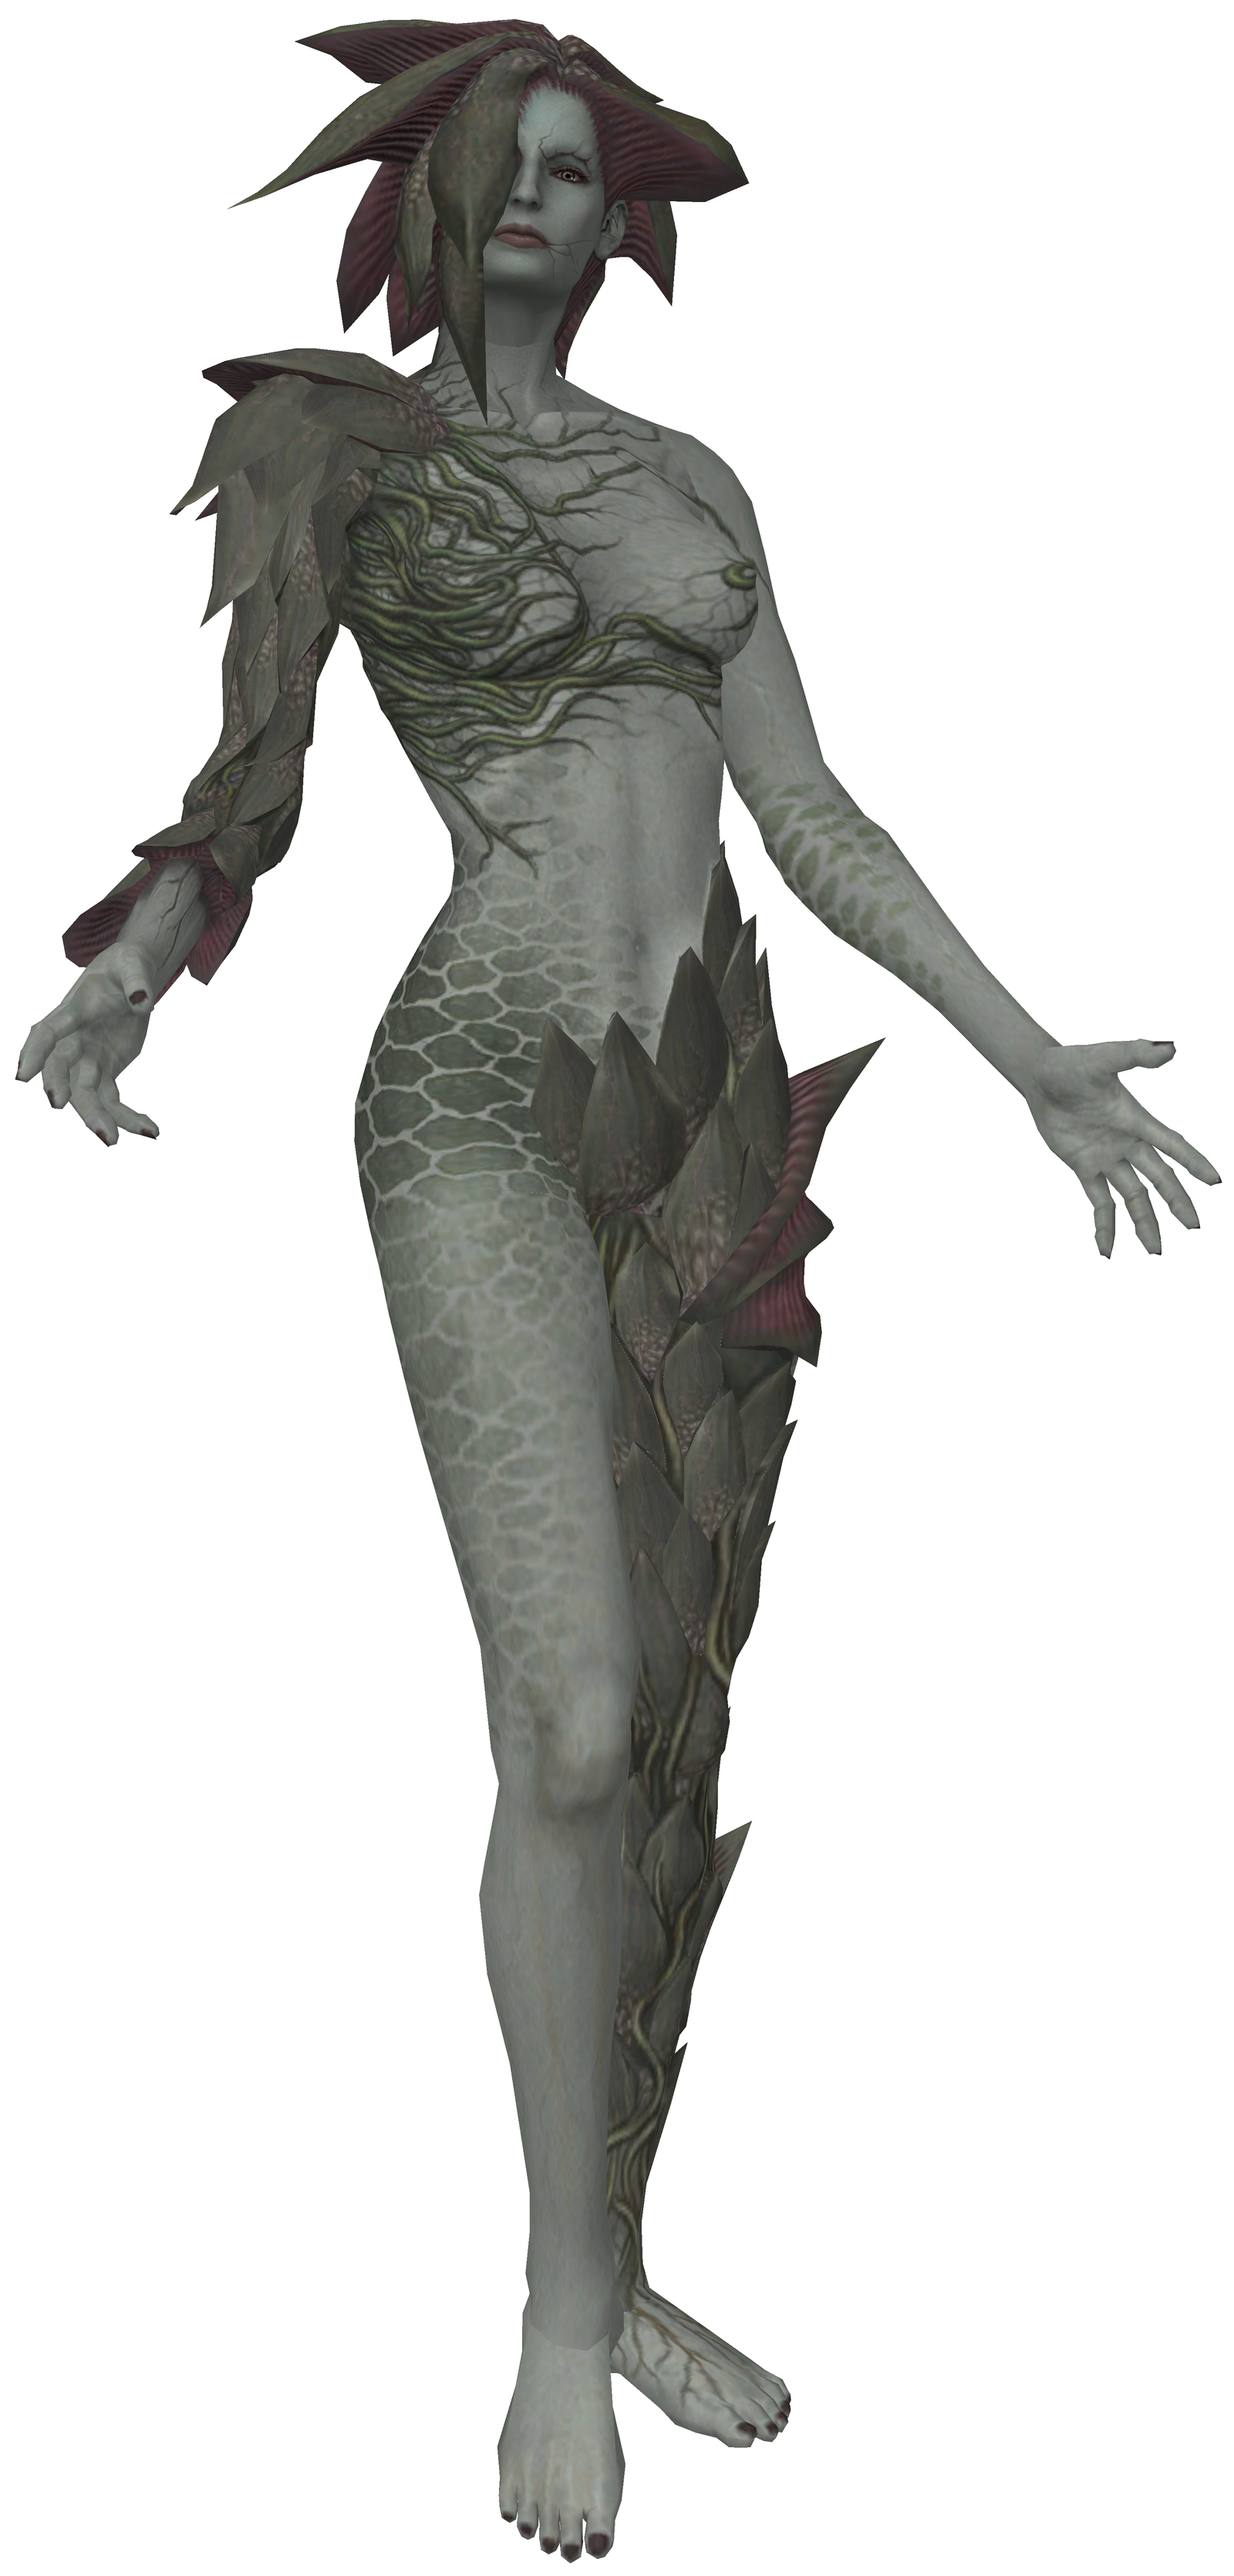 Resident evil alexia porno nackt download